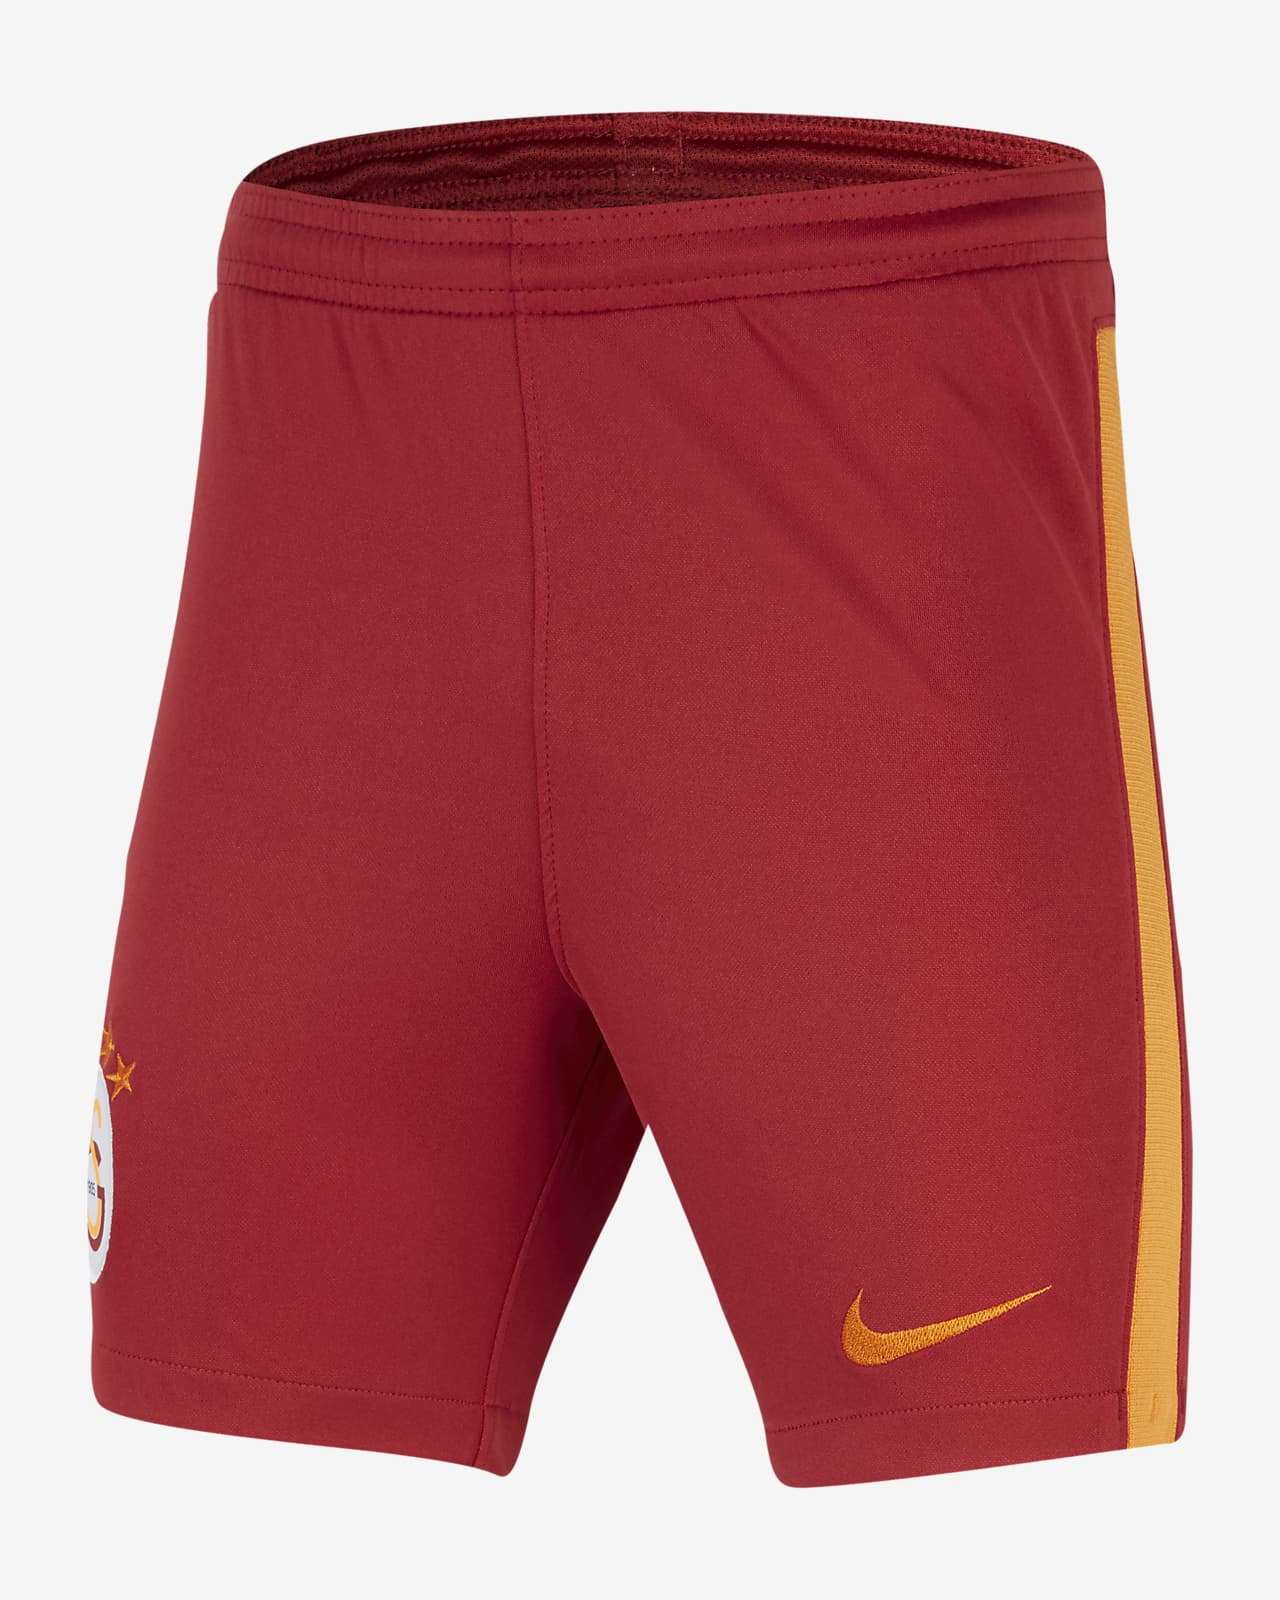 Shorts de fútbol para niños talla grande Galatasaray 2020/21 Stadium Home/Away